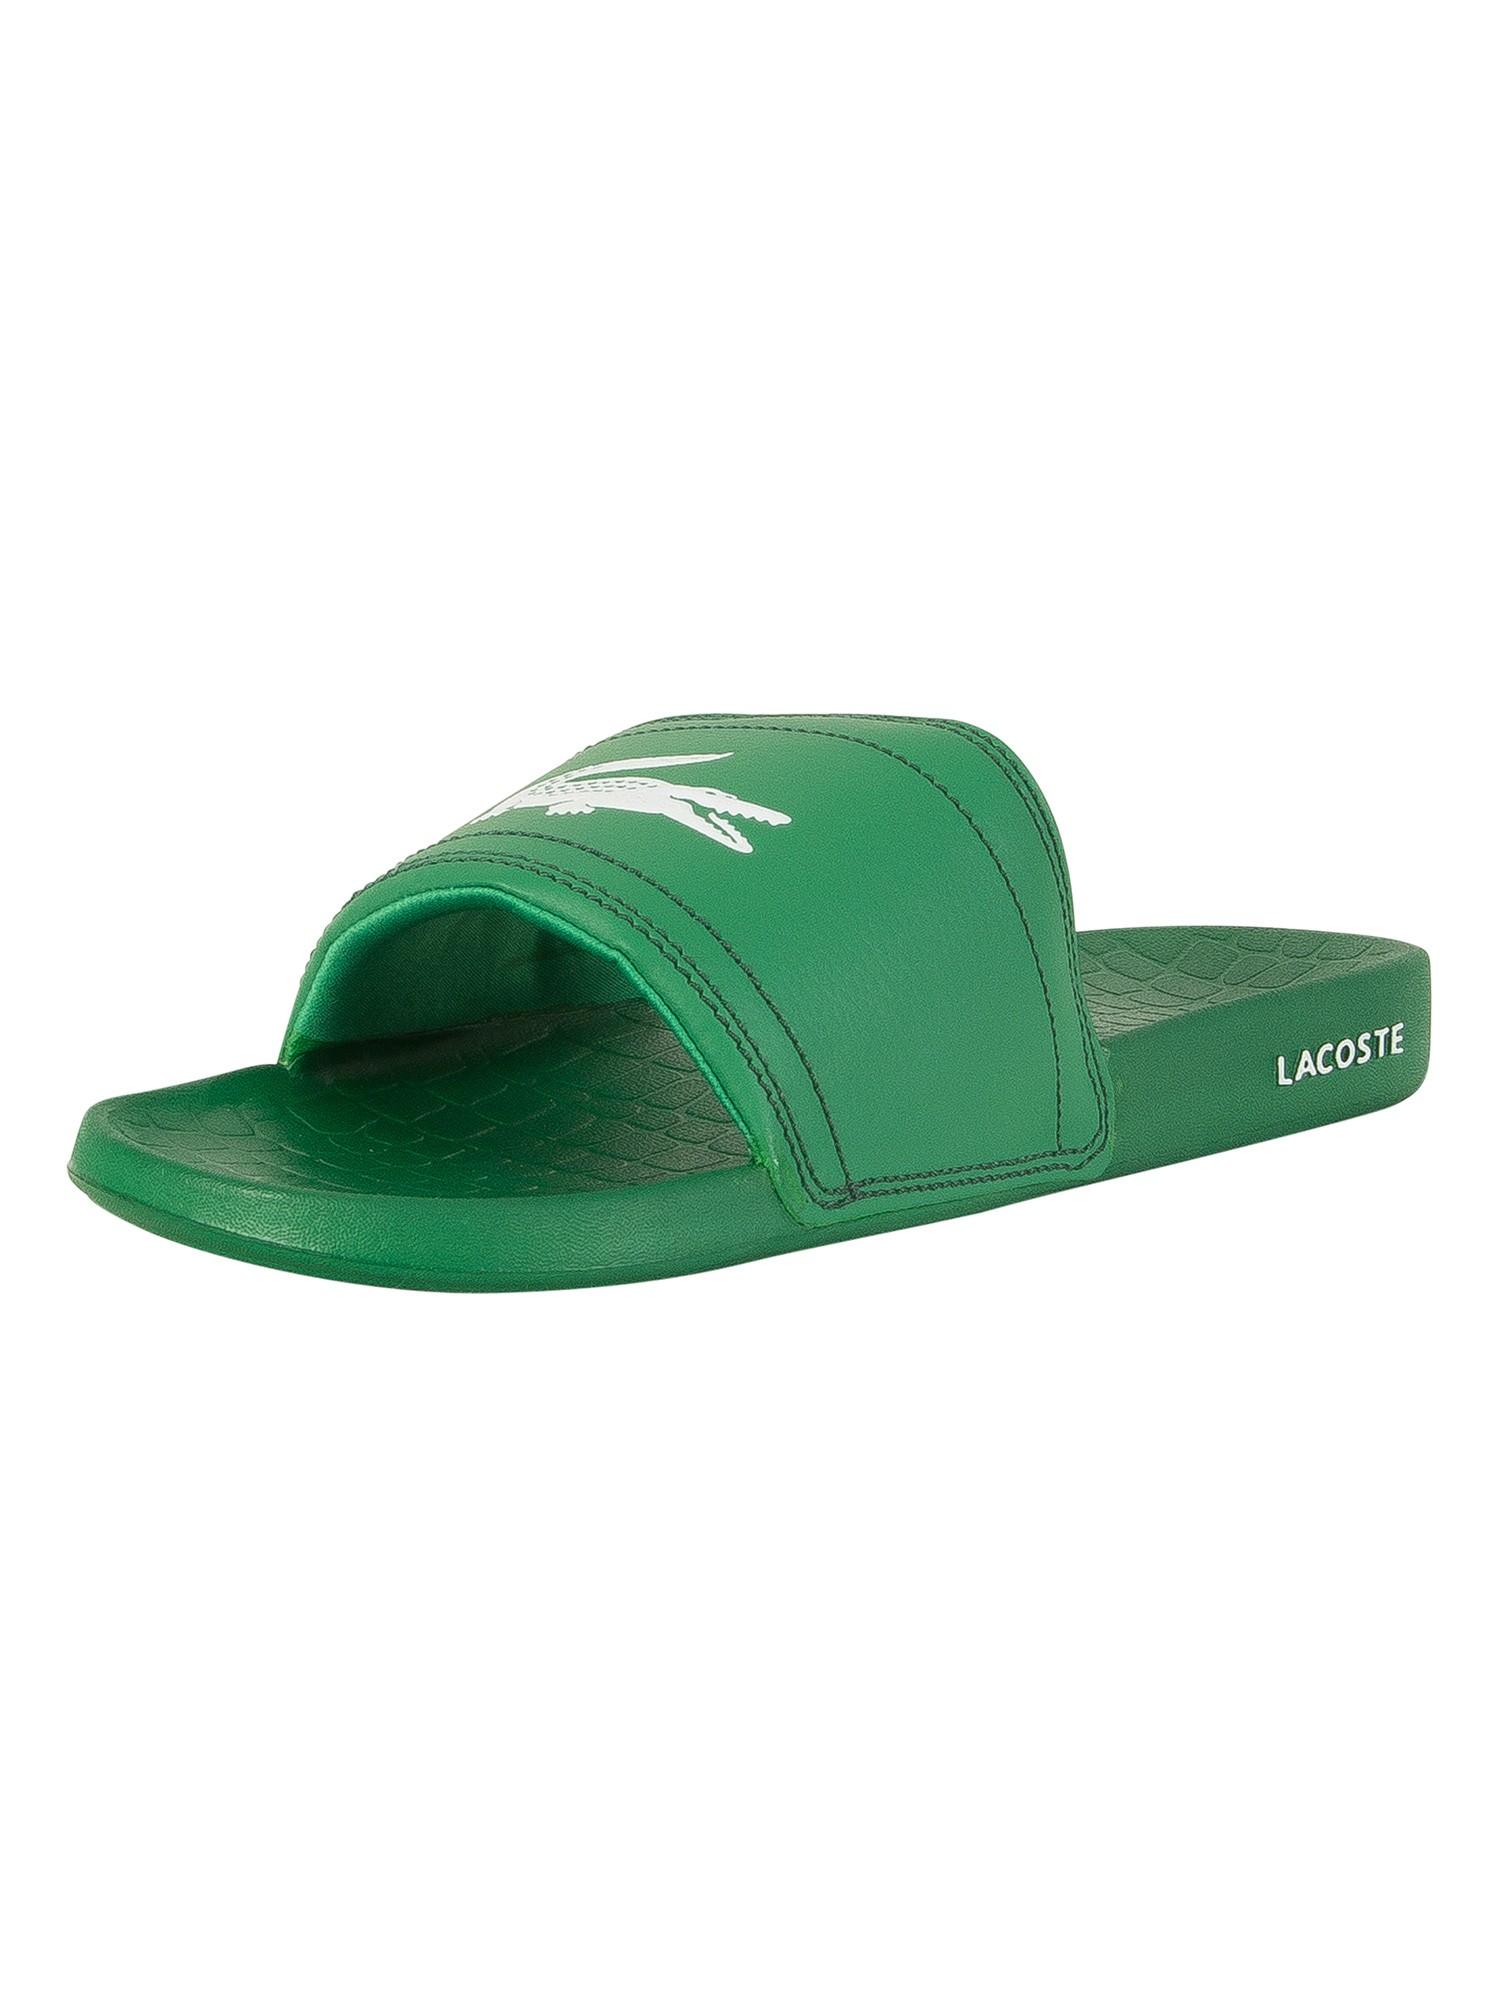 81bea461509f5a Lacoste Green Green Fraisier BRD1 US SPM Flip Flops